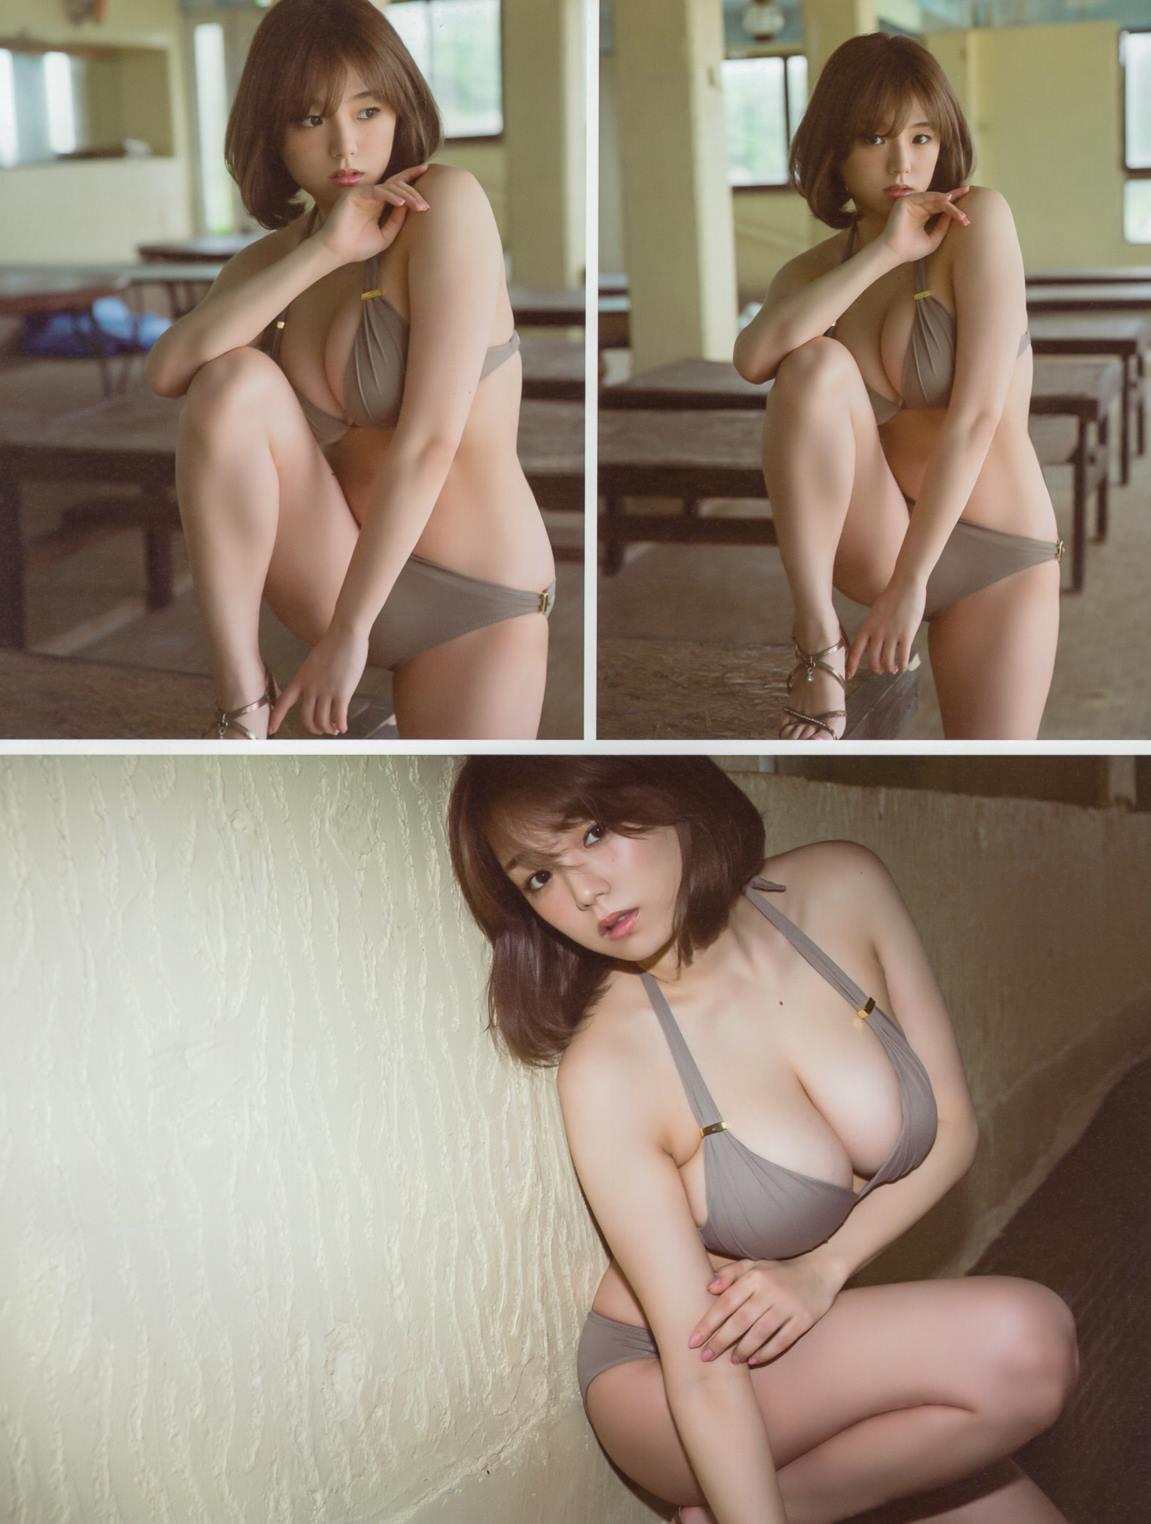 篠崎愛 103 [無断転載禁止]©bbspink.comYouTube動画>2本 ->画像>995枚